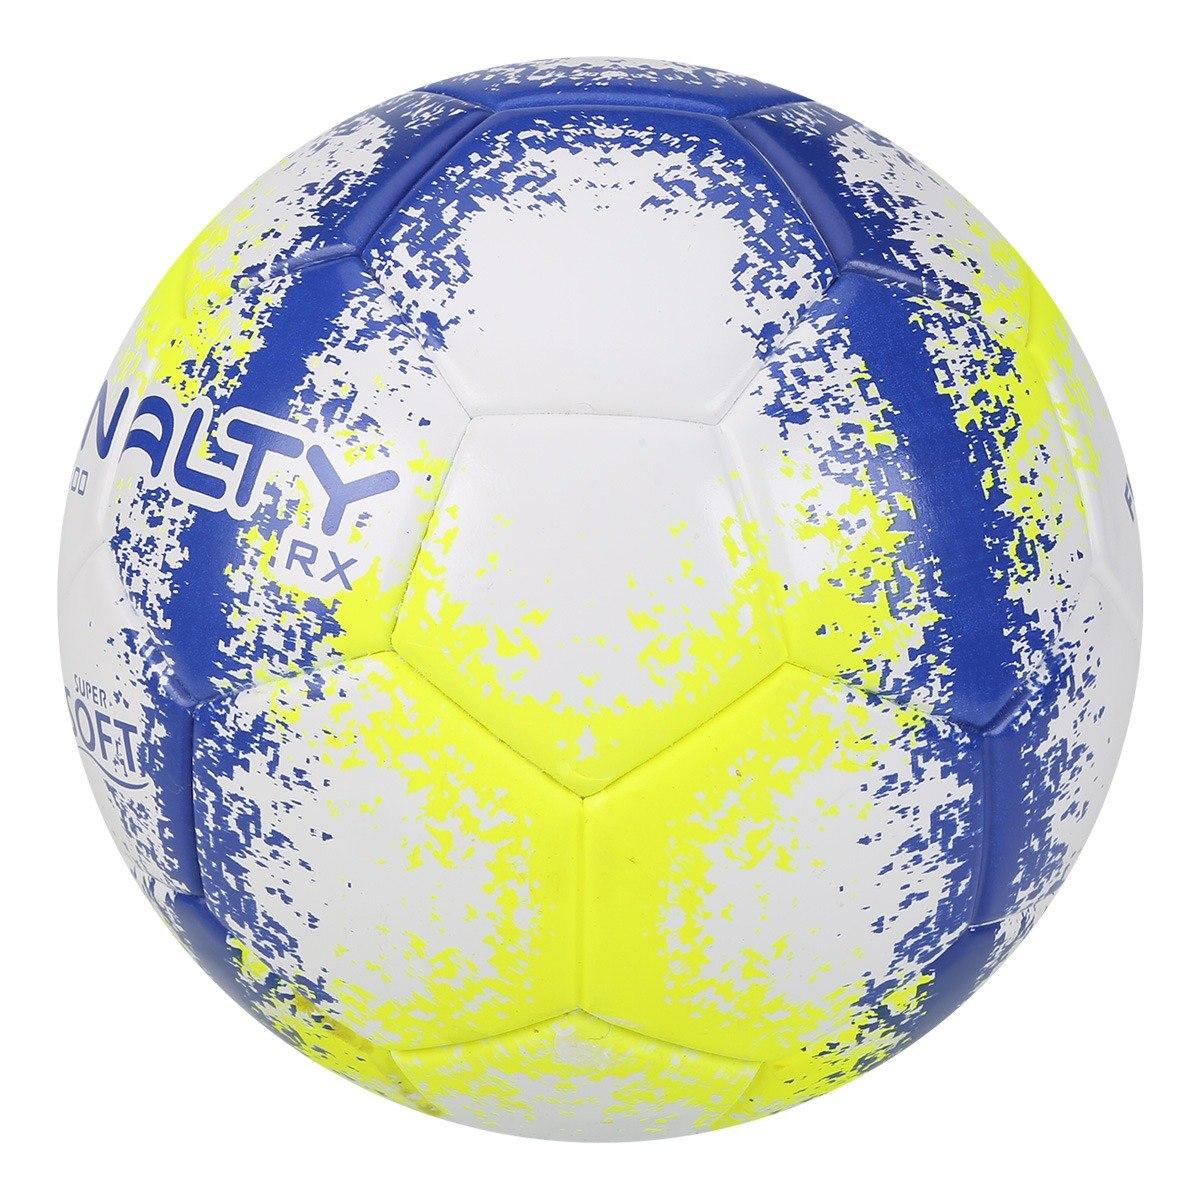 1ae410fc7c ... rx 200 r3 fusion vlll top. Carregando zoom... bola penalty futsal.  Carregando zoom.